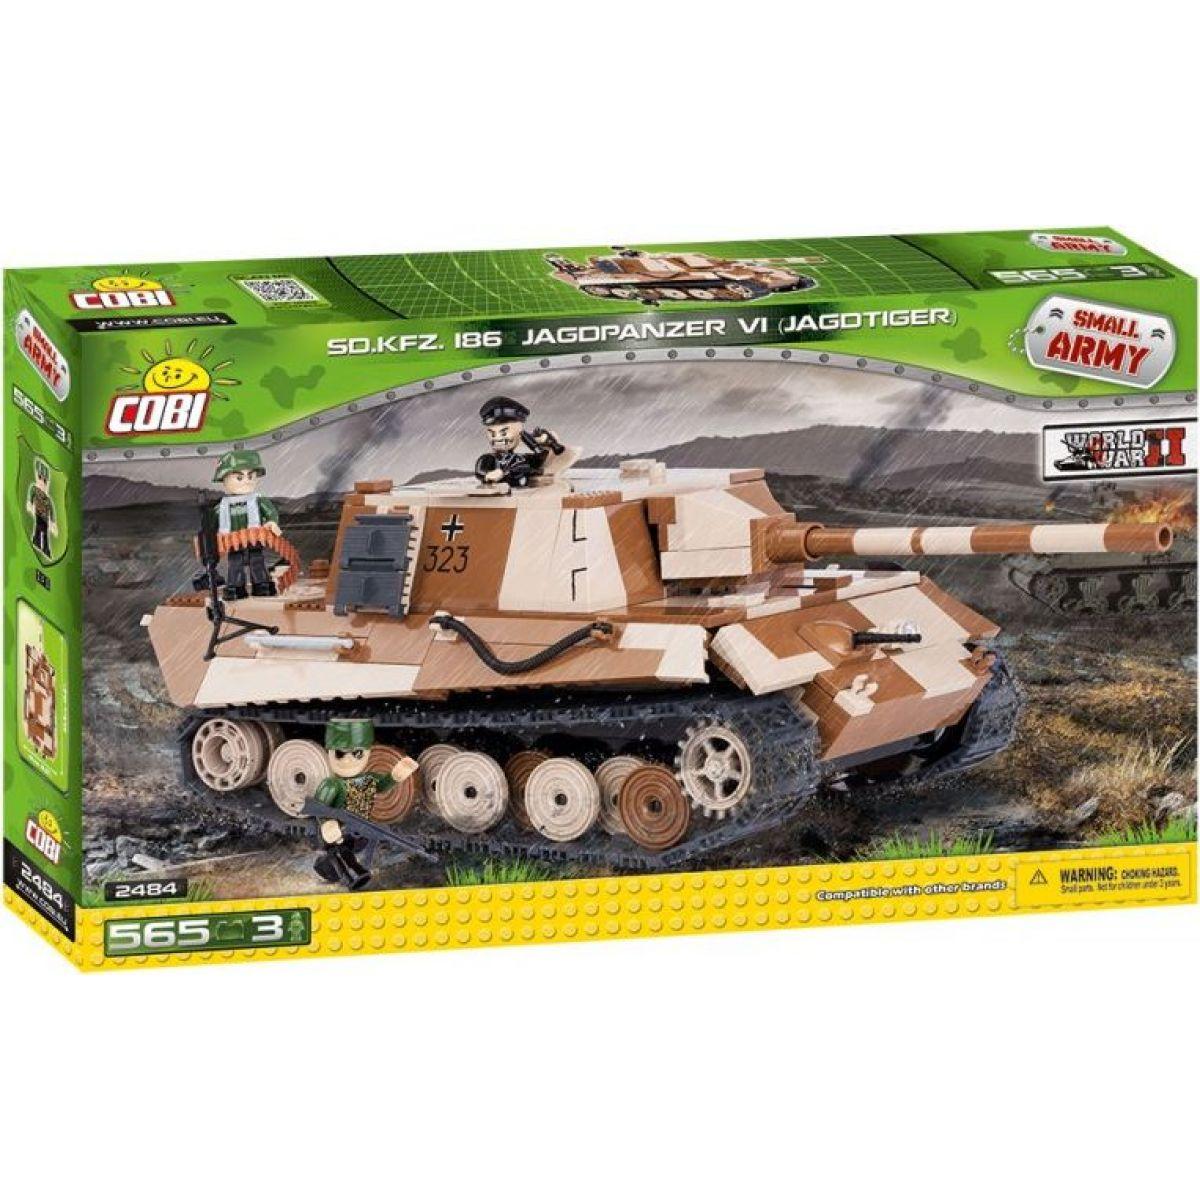 Cobi Malá armáda 2484 II WW Jagdpanzer VI Jagdtiger